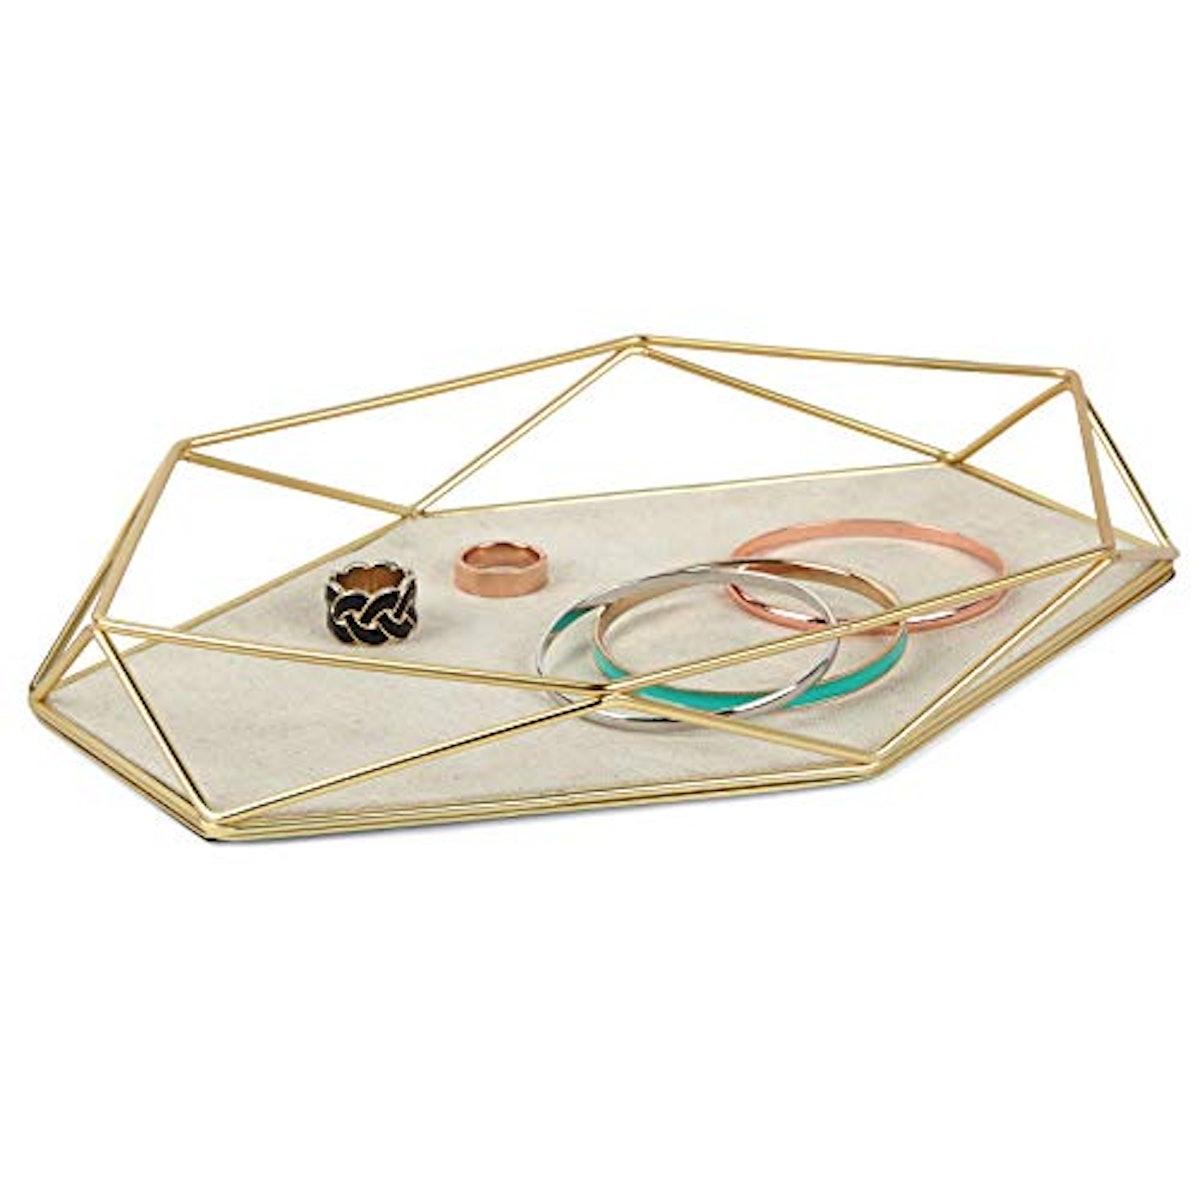 Umbra Geometric Plated Jewelry Storage